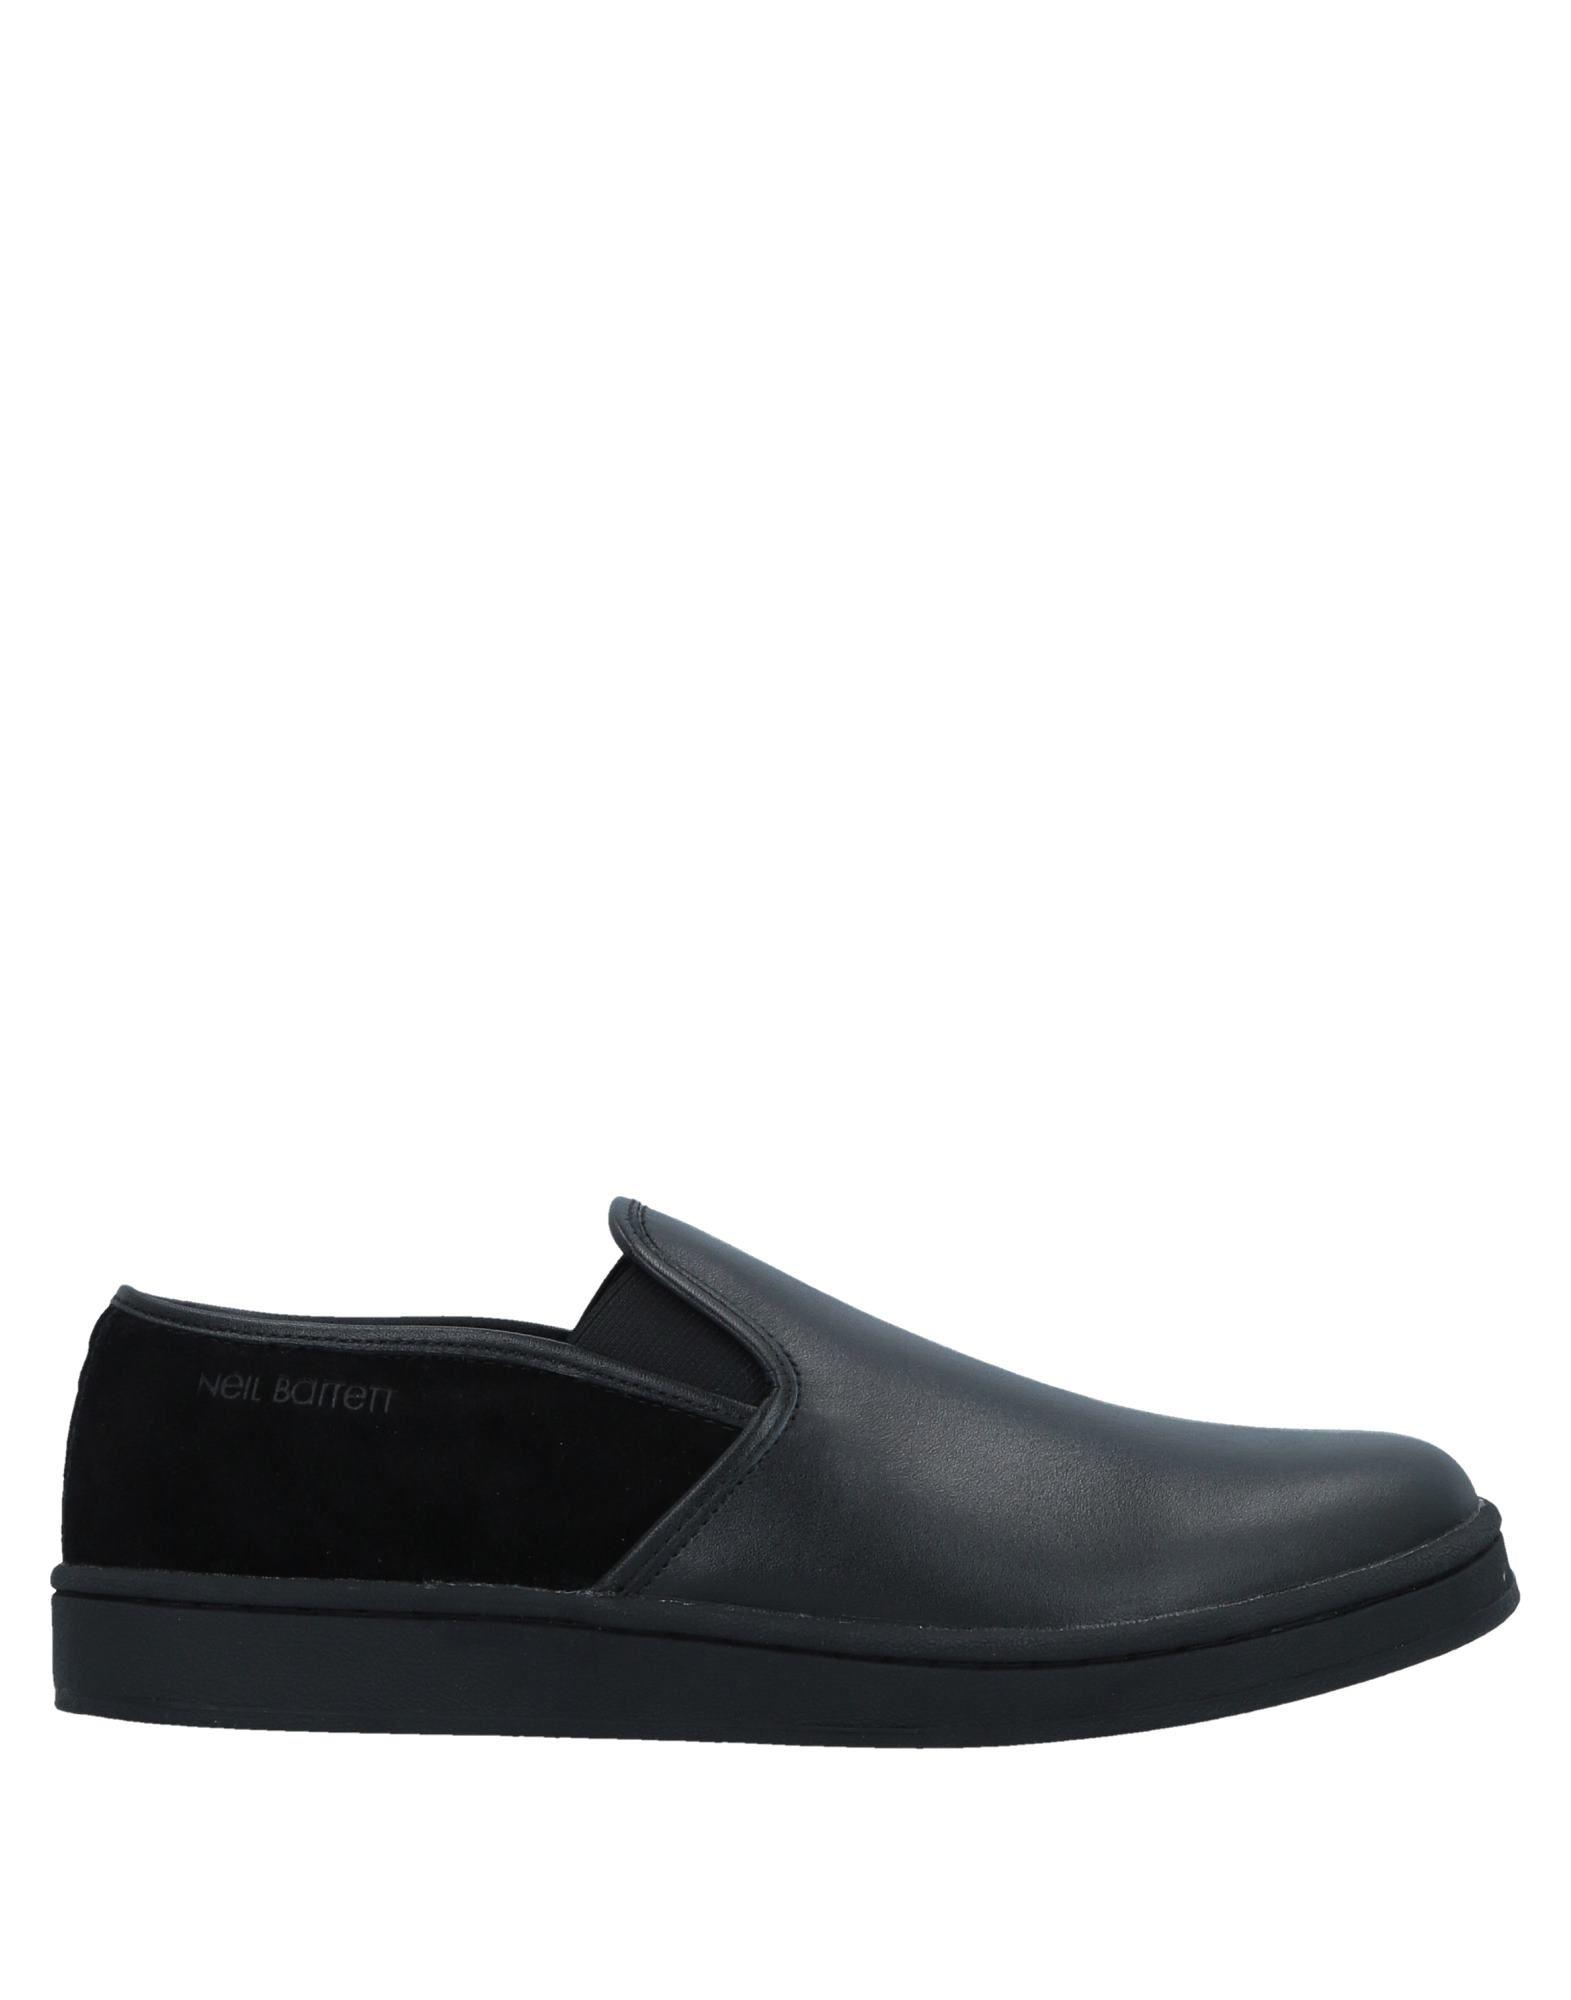 Neil Barrett Sneakers Herren  11522279TA